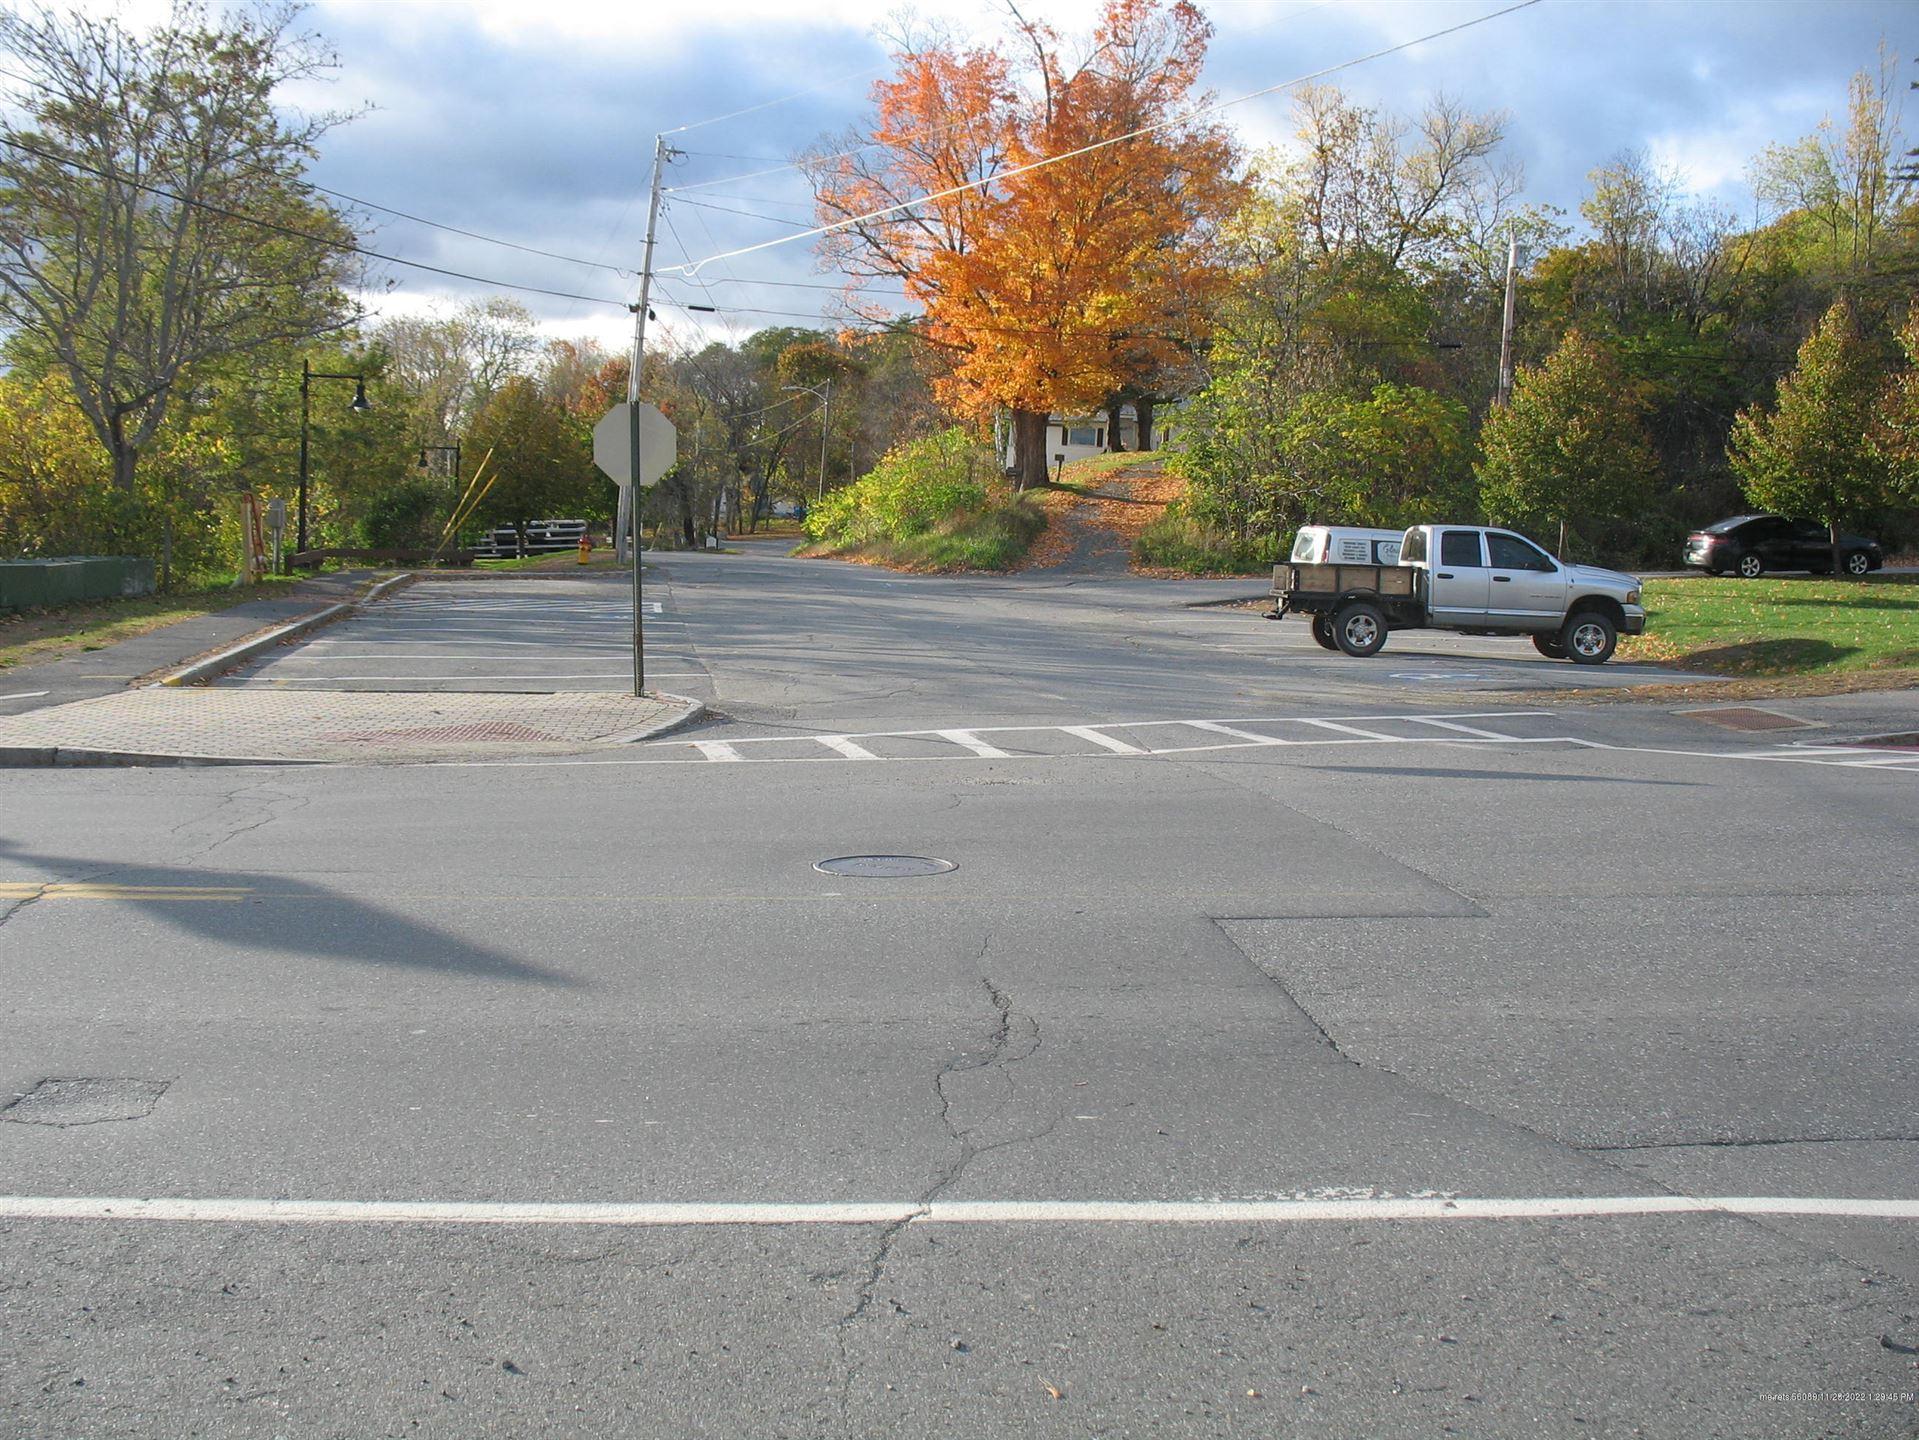 Photo of 31 Main Street Street, Milo, ME 04463 (MLS # 1512743)